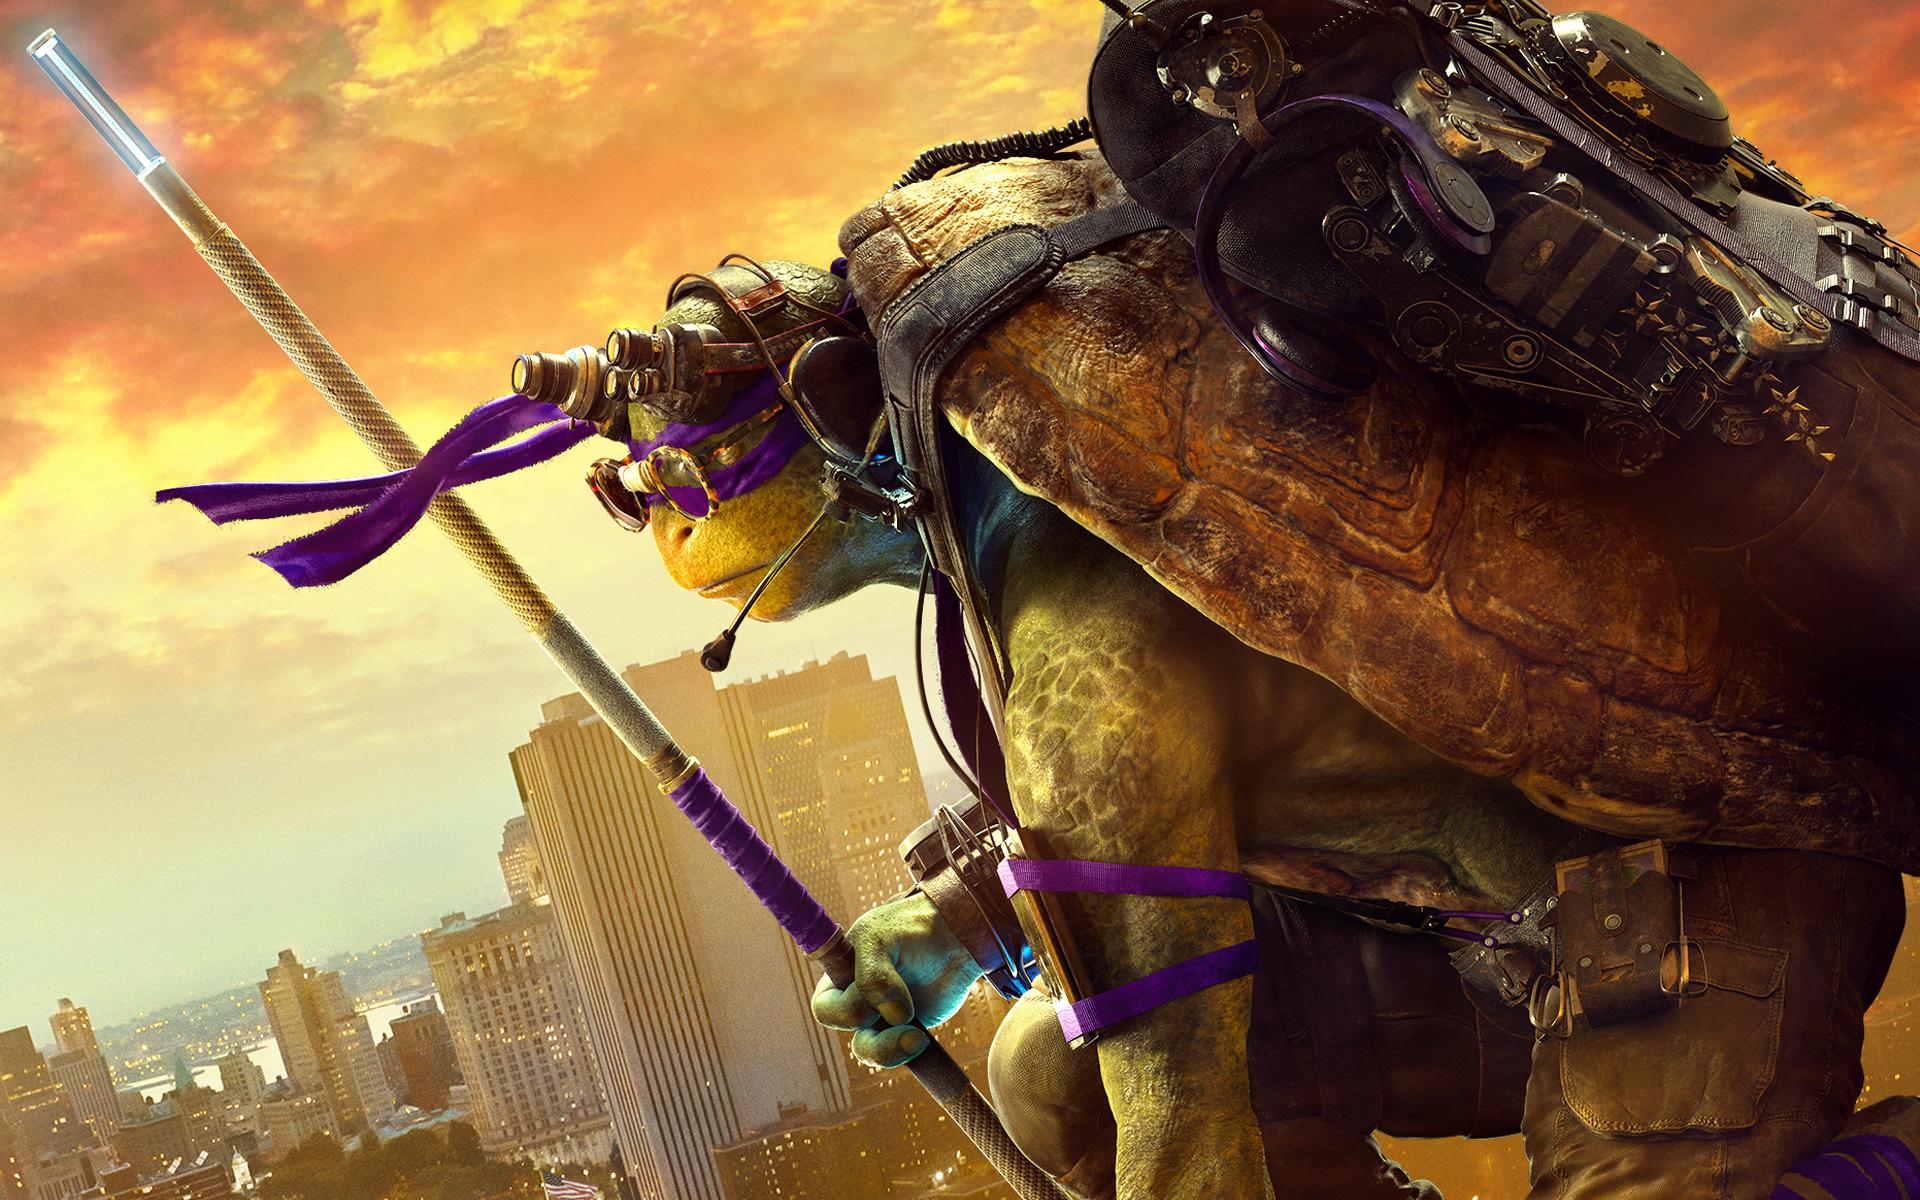 Teenage Mutant Ninja Turtles Out Of The Shadows Hd Movies 4k